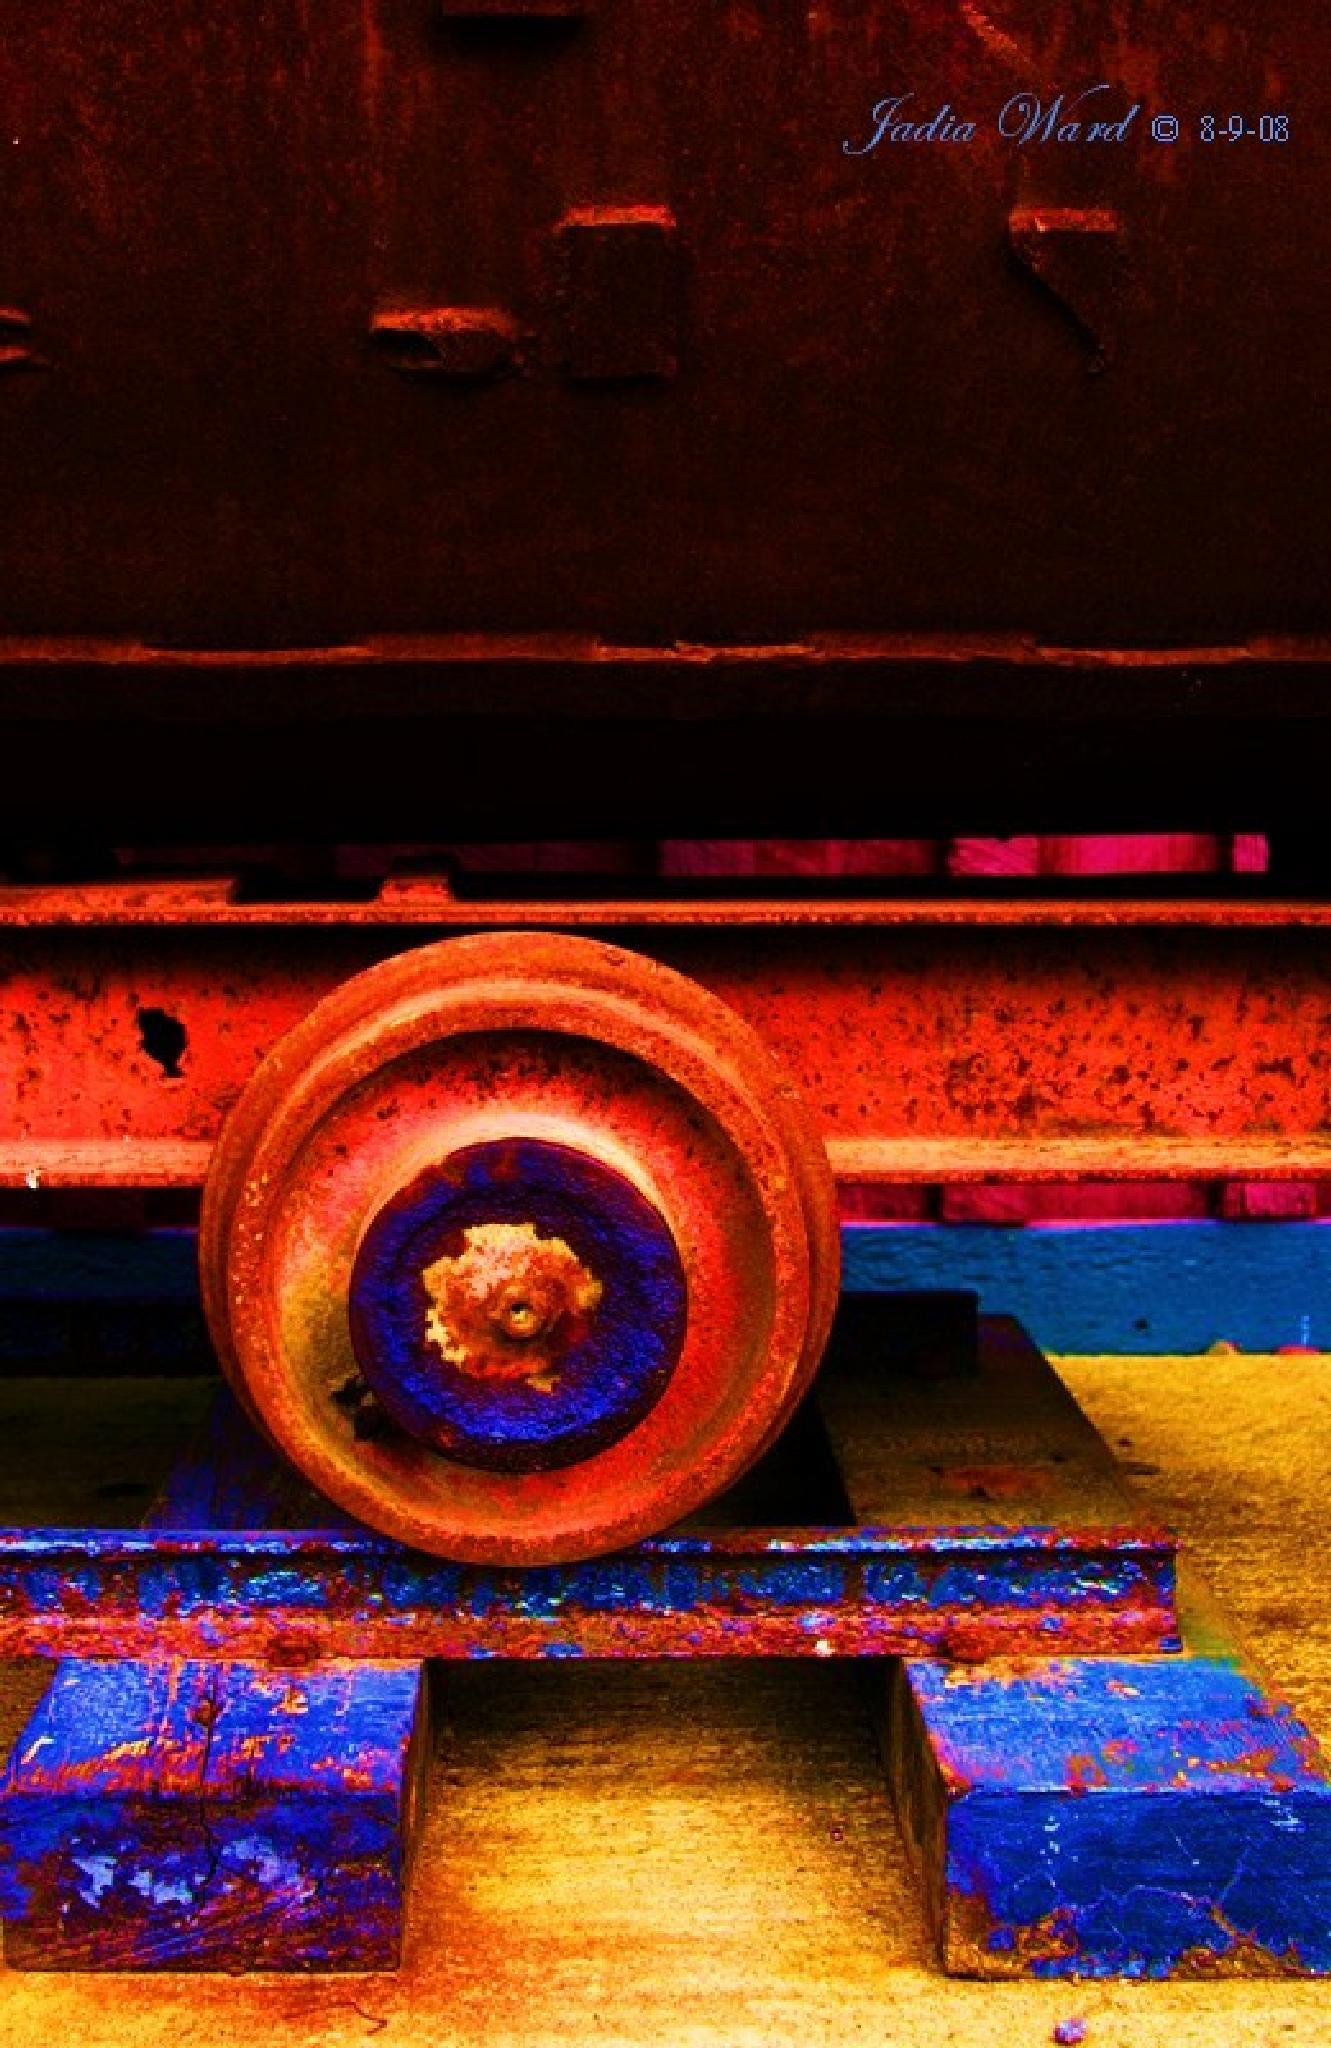 Wheels of Yester-Years by jadia.ward